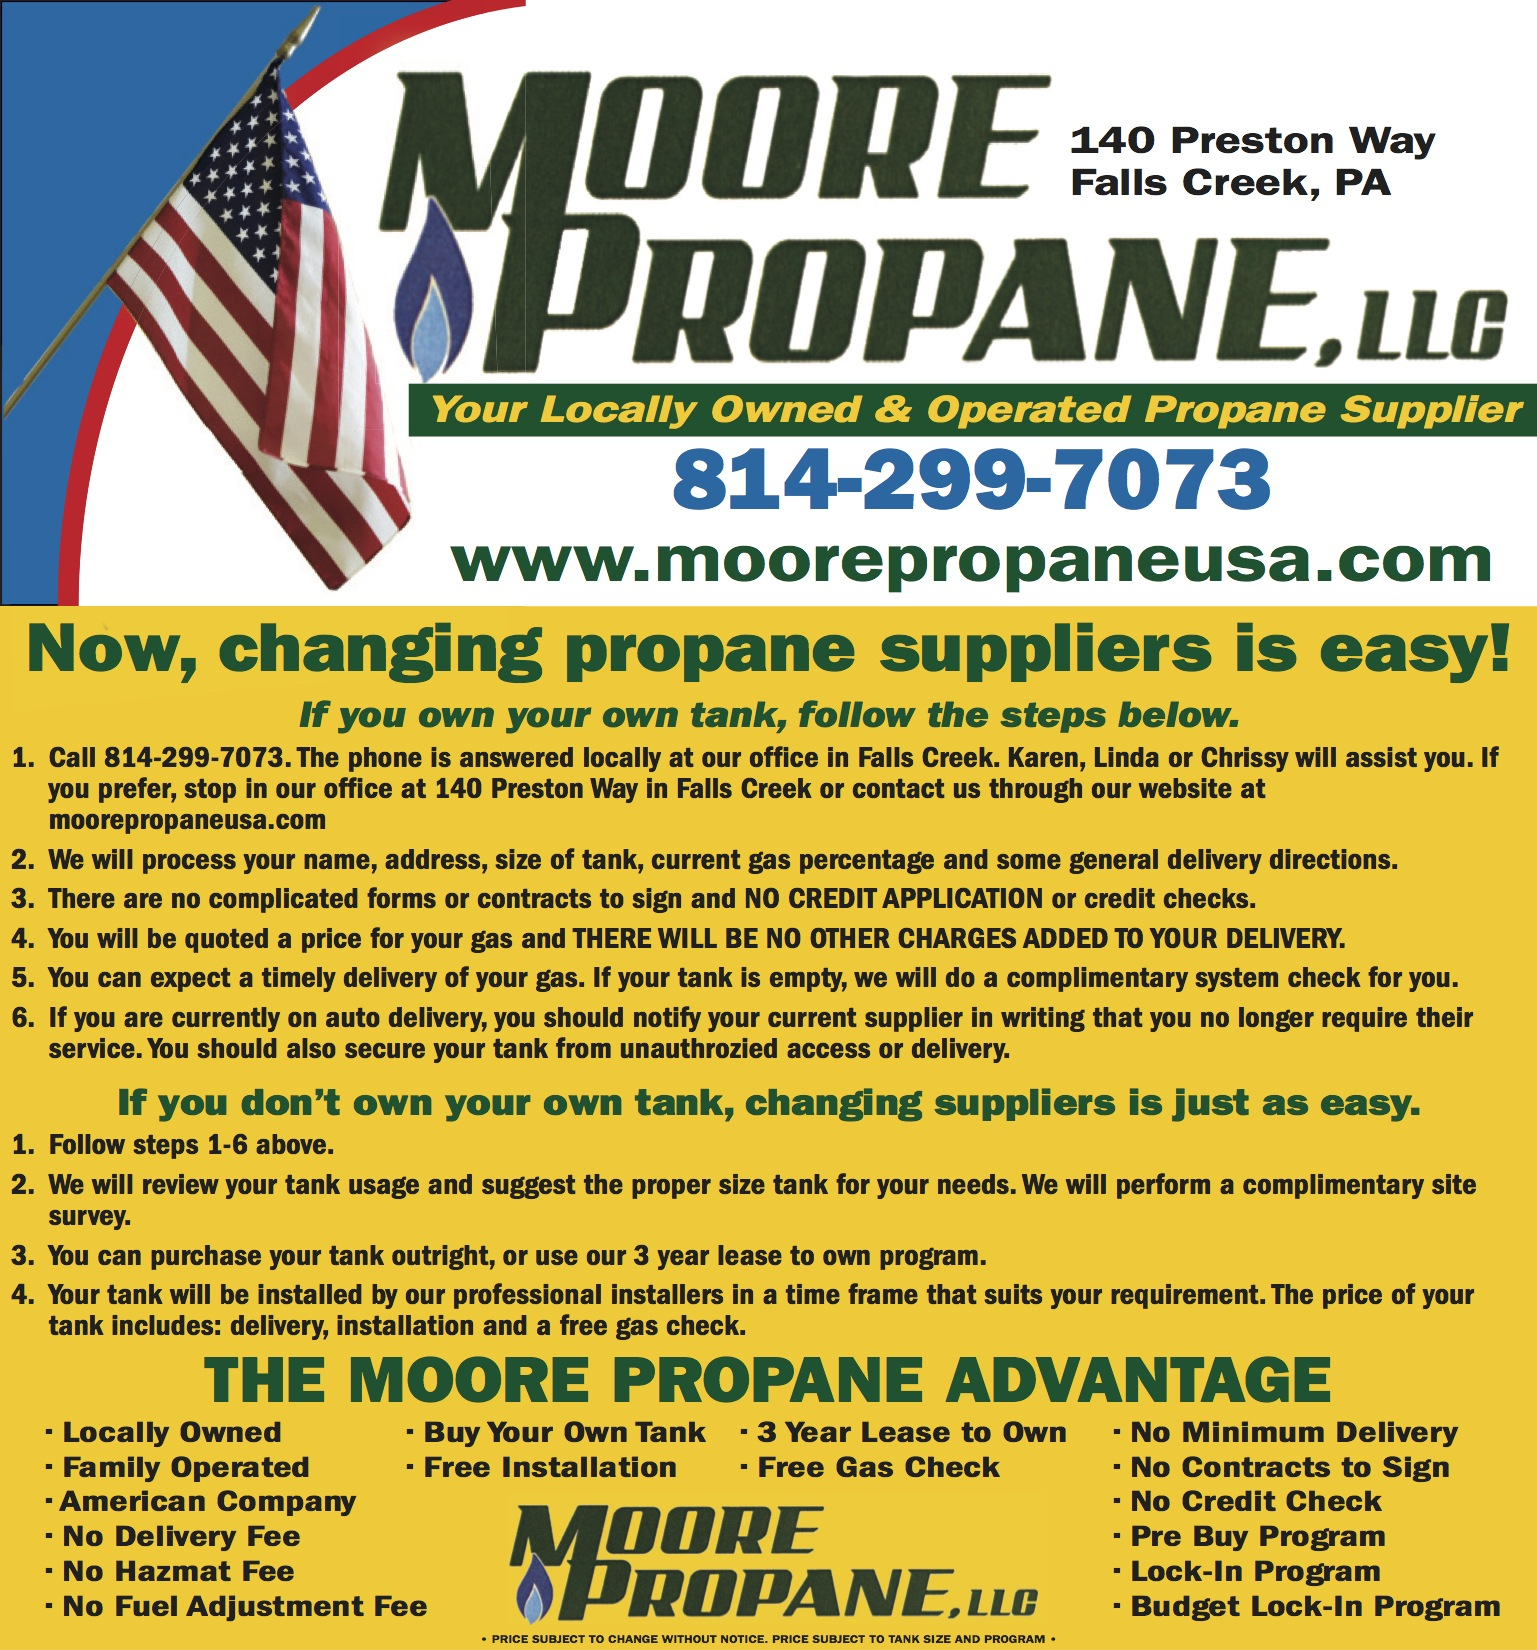 How to Change Propane Suppliers | Moore Propane, LLC